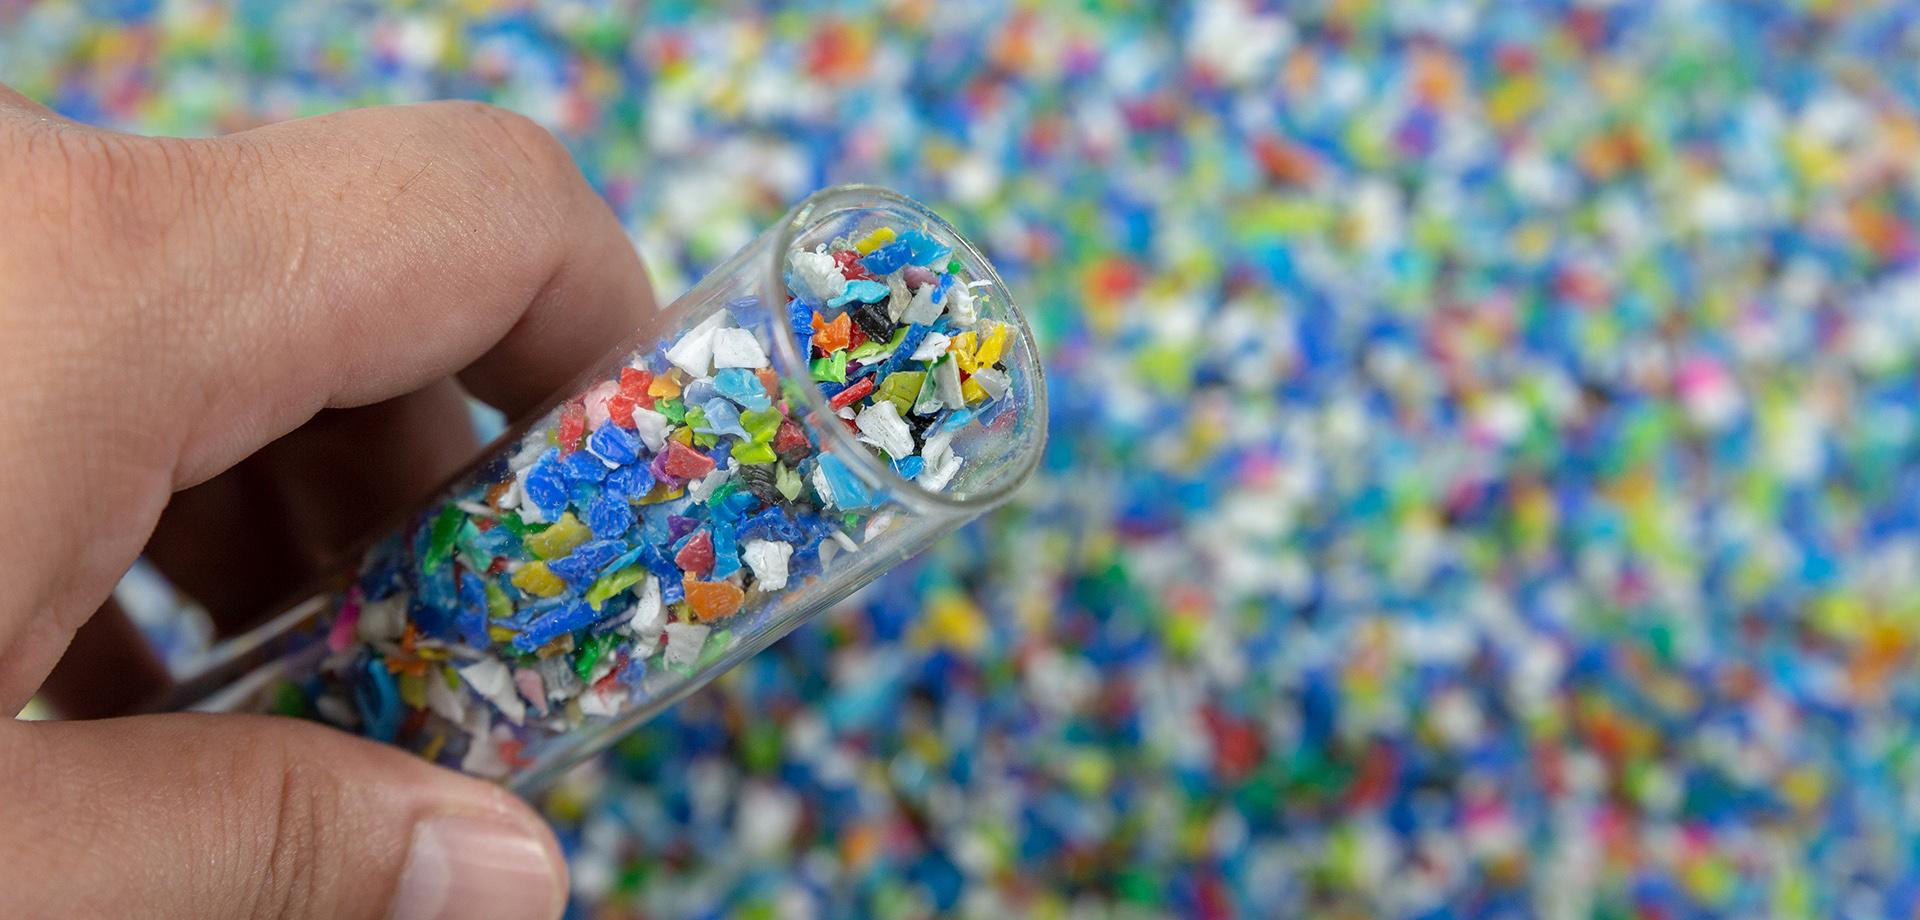 Neue Technologiemaßstäbe für Recycling.